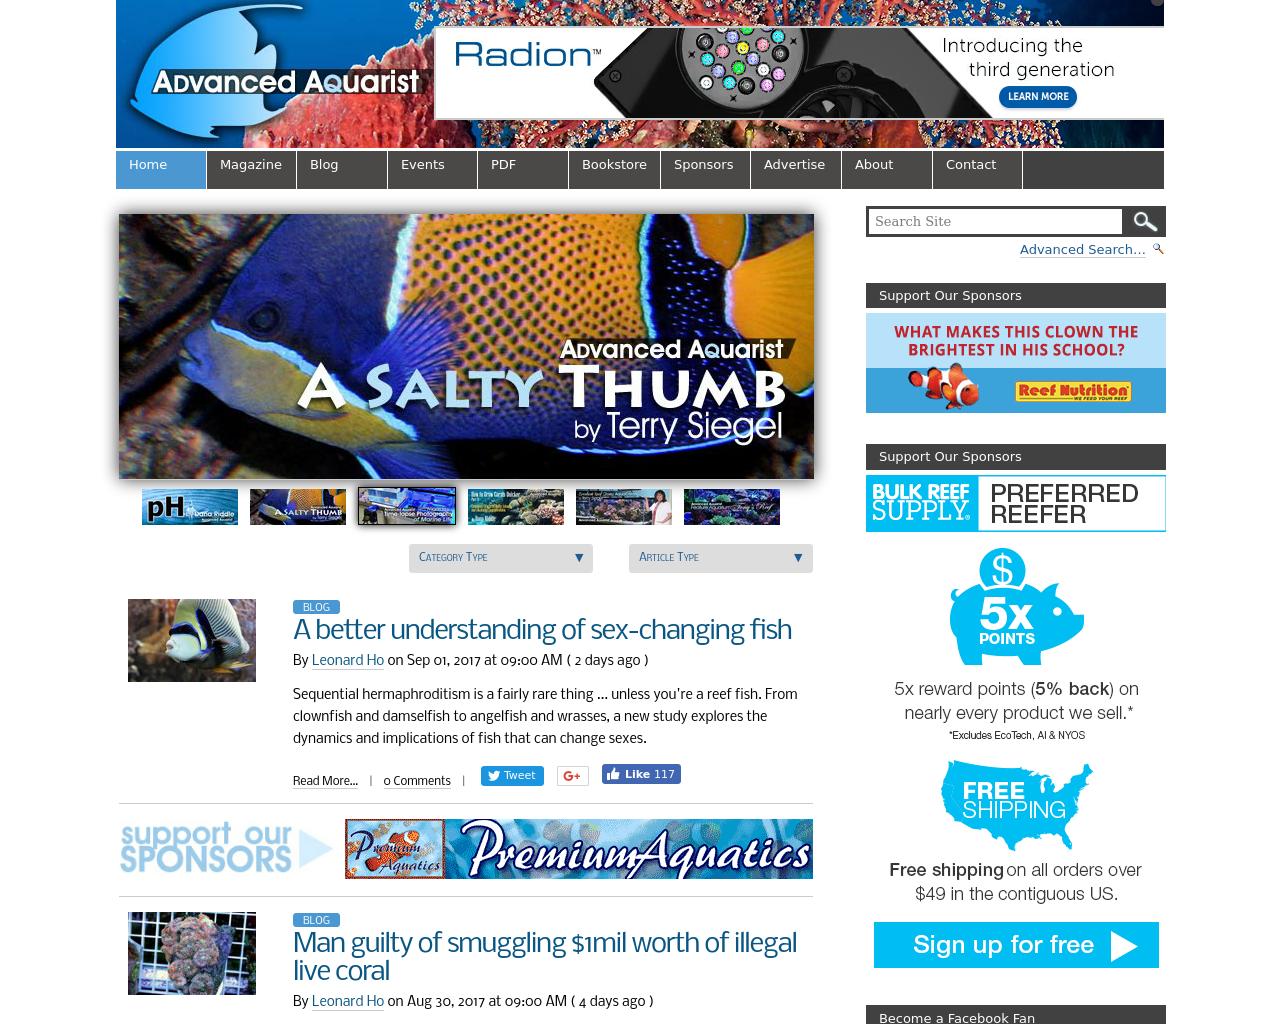 Advanced-Aquarist-Advertising-Reviews-Pricing